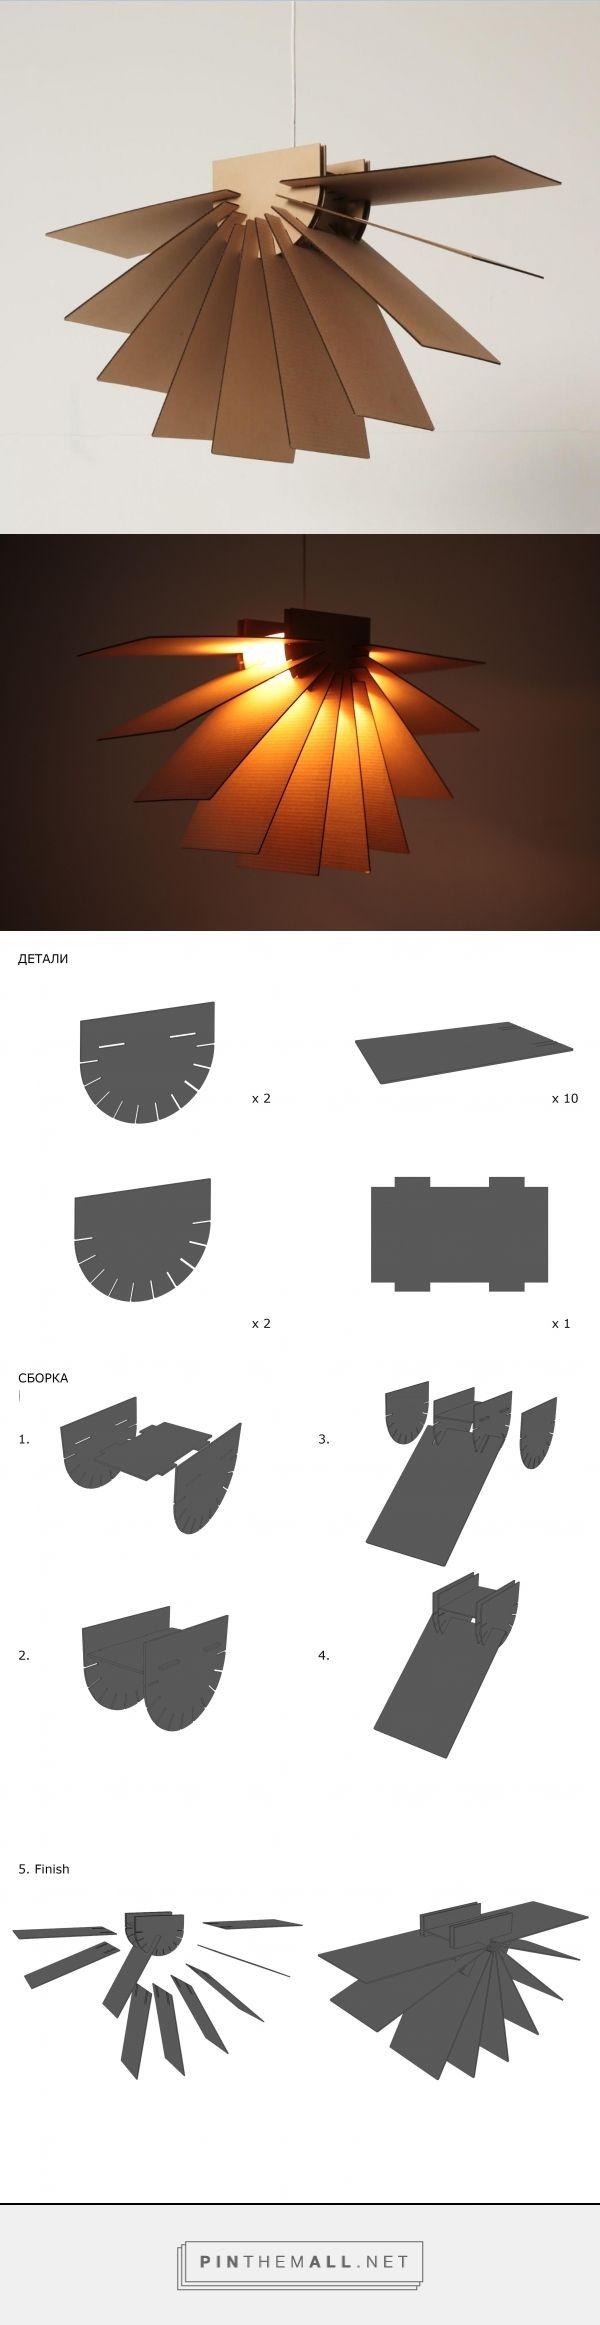 570cc7f754241.jpg 600×2,325 pixeles